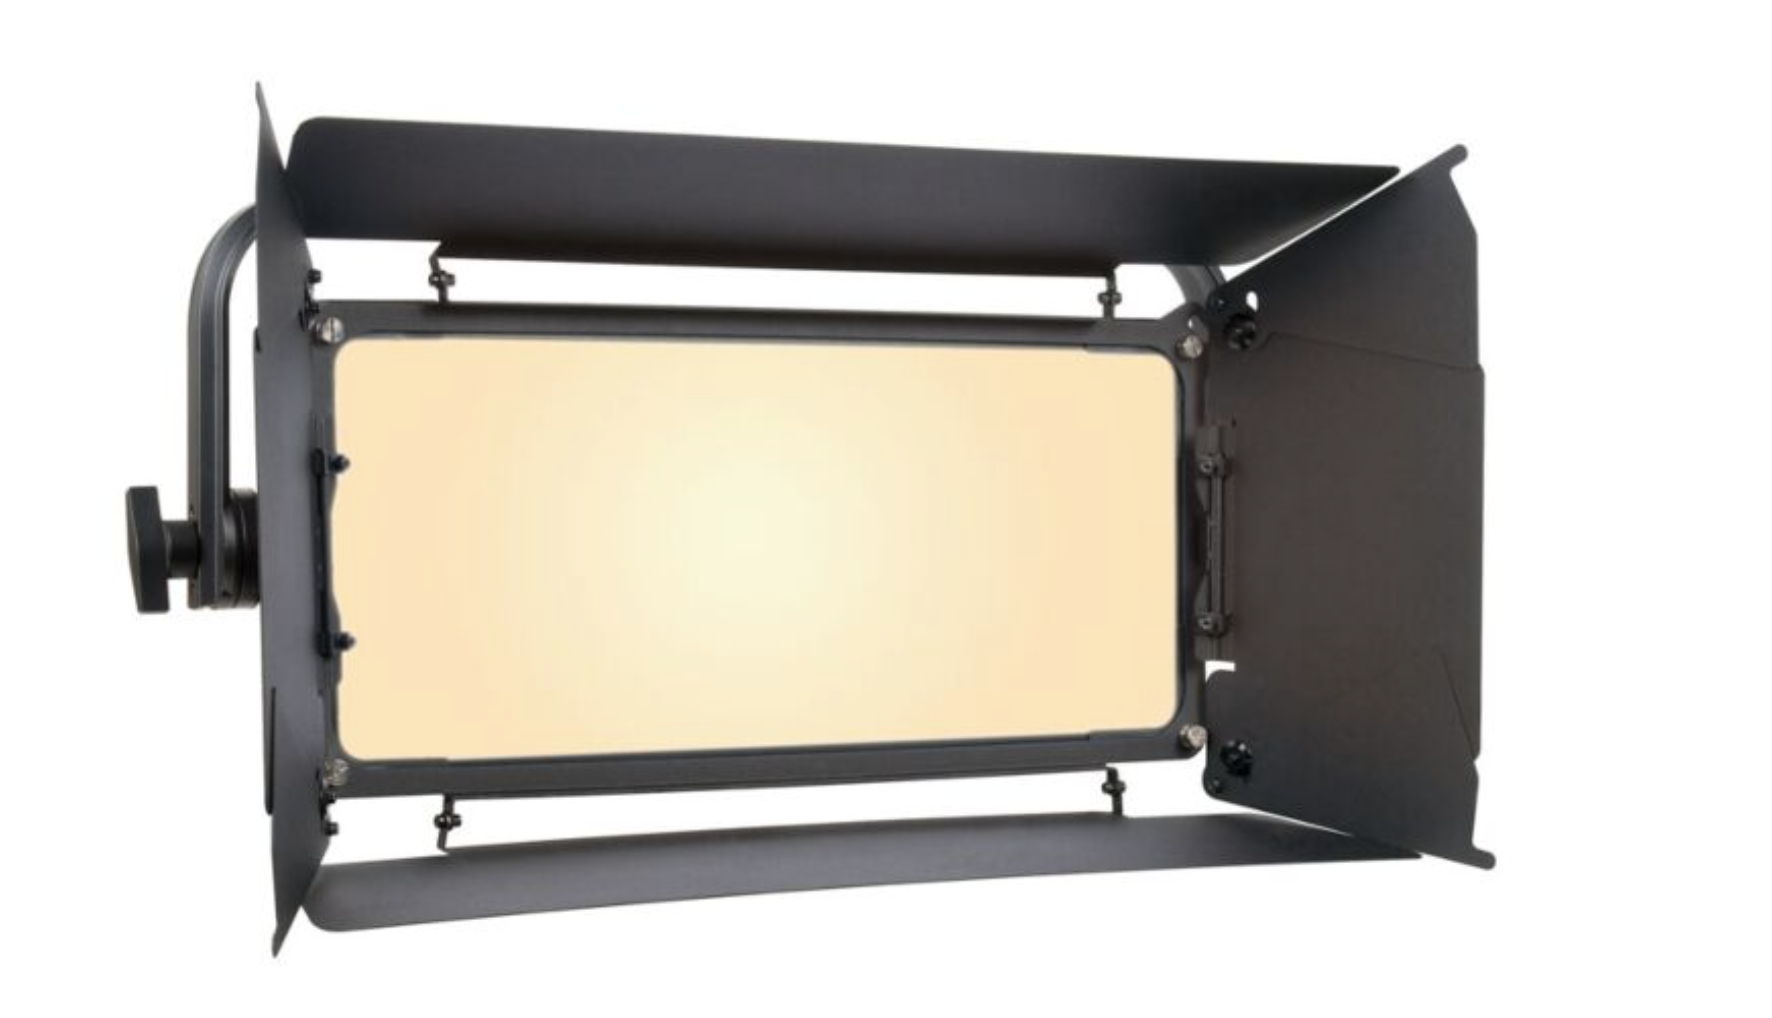 Éclairage TVL Softlight DW - Elation Image